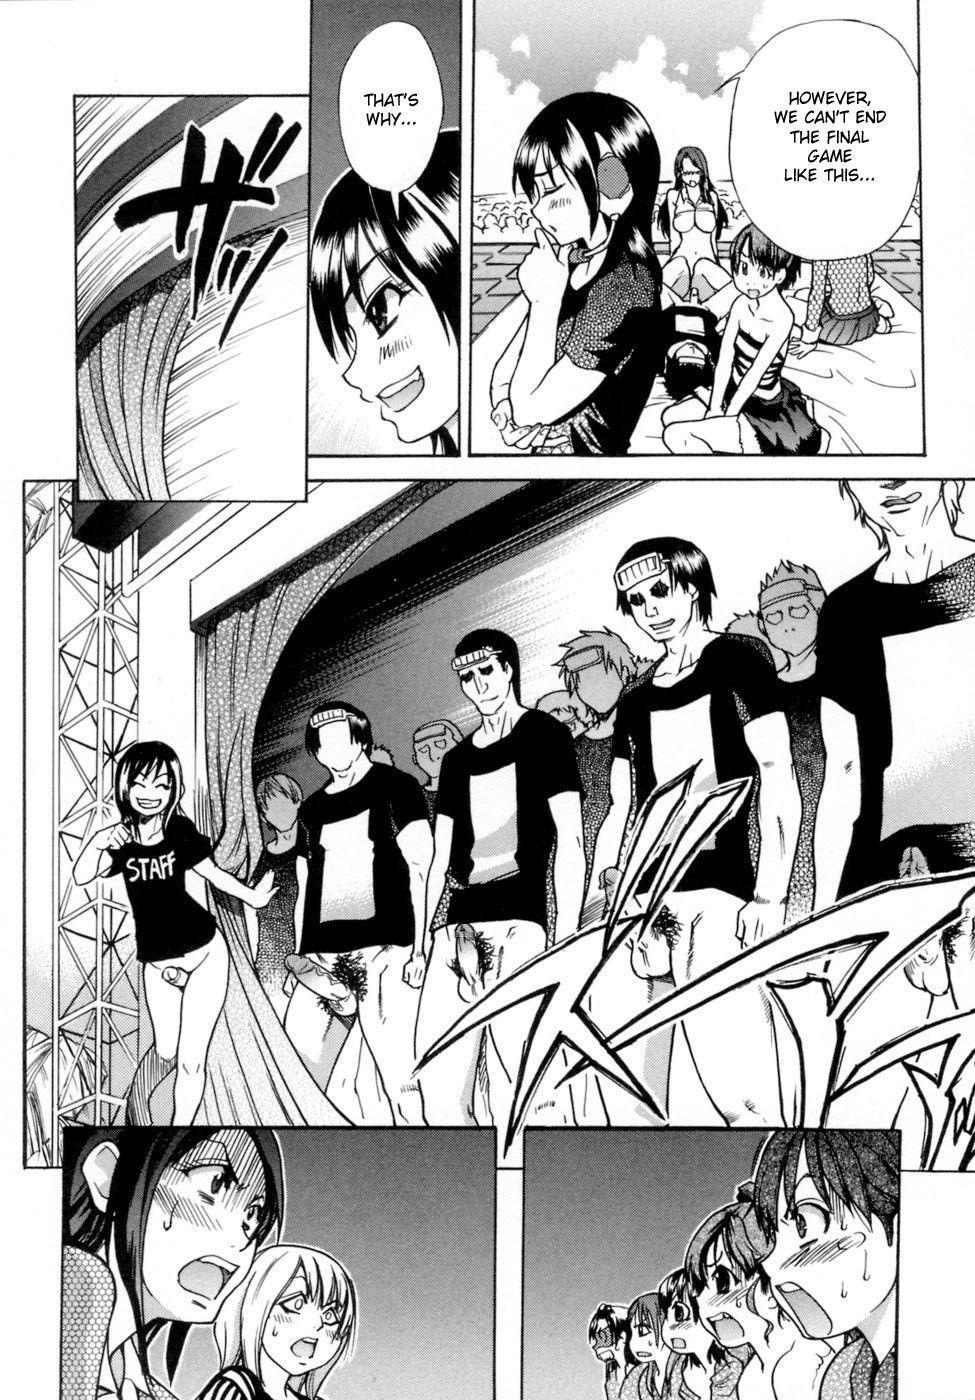 Shining Musume. 5. Five Sense of Love 81